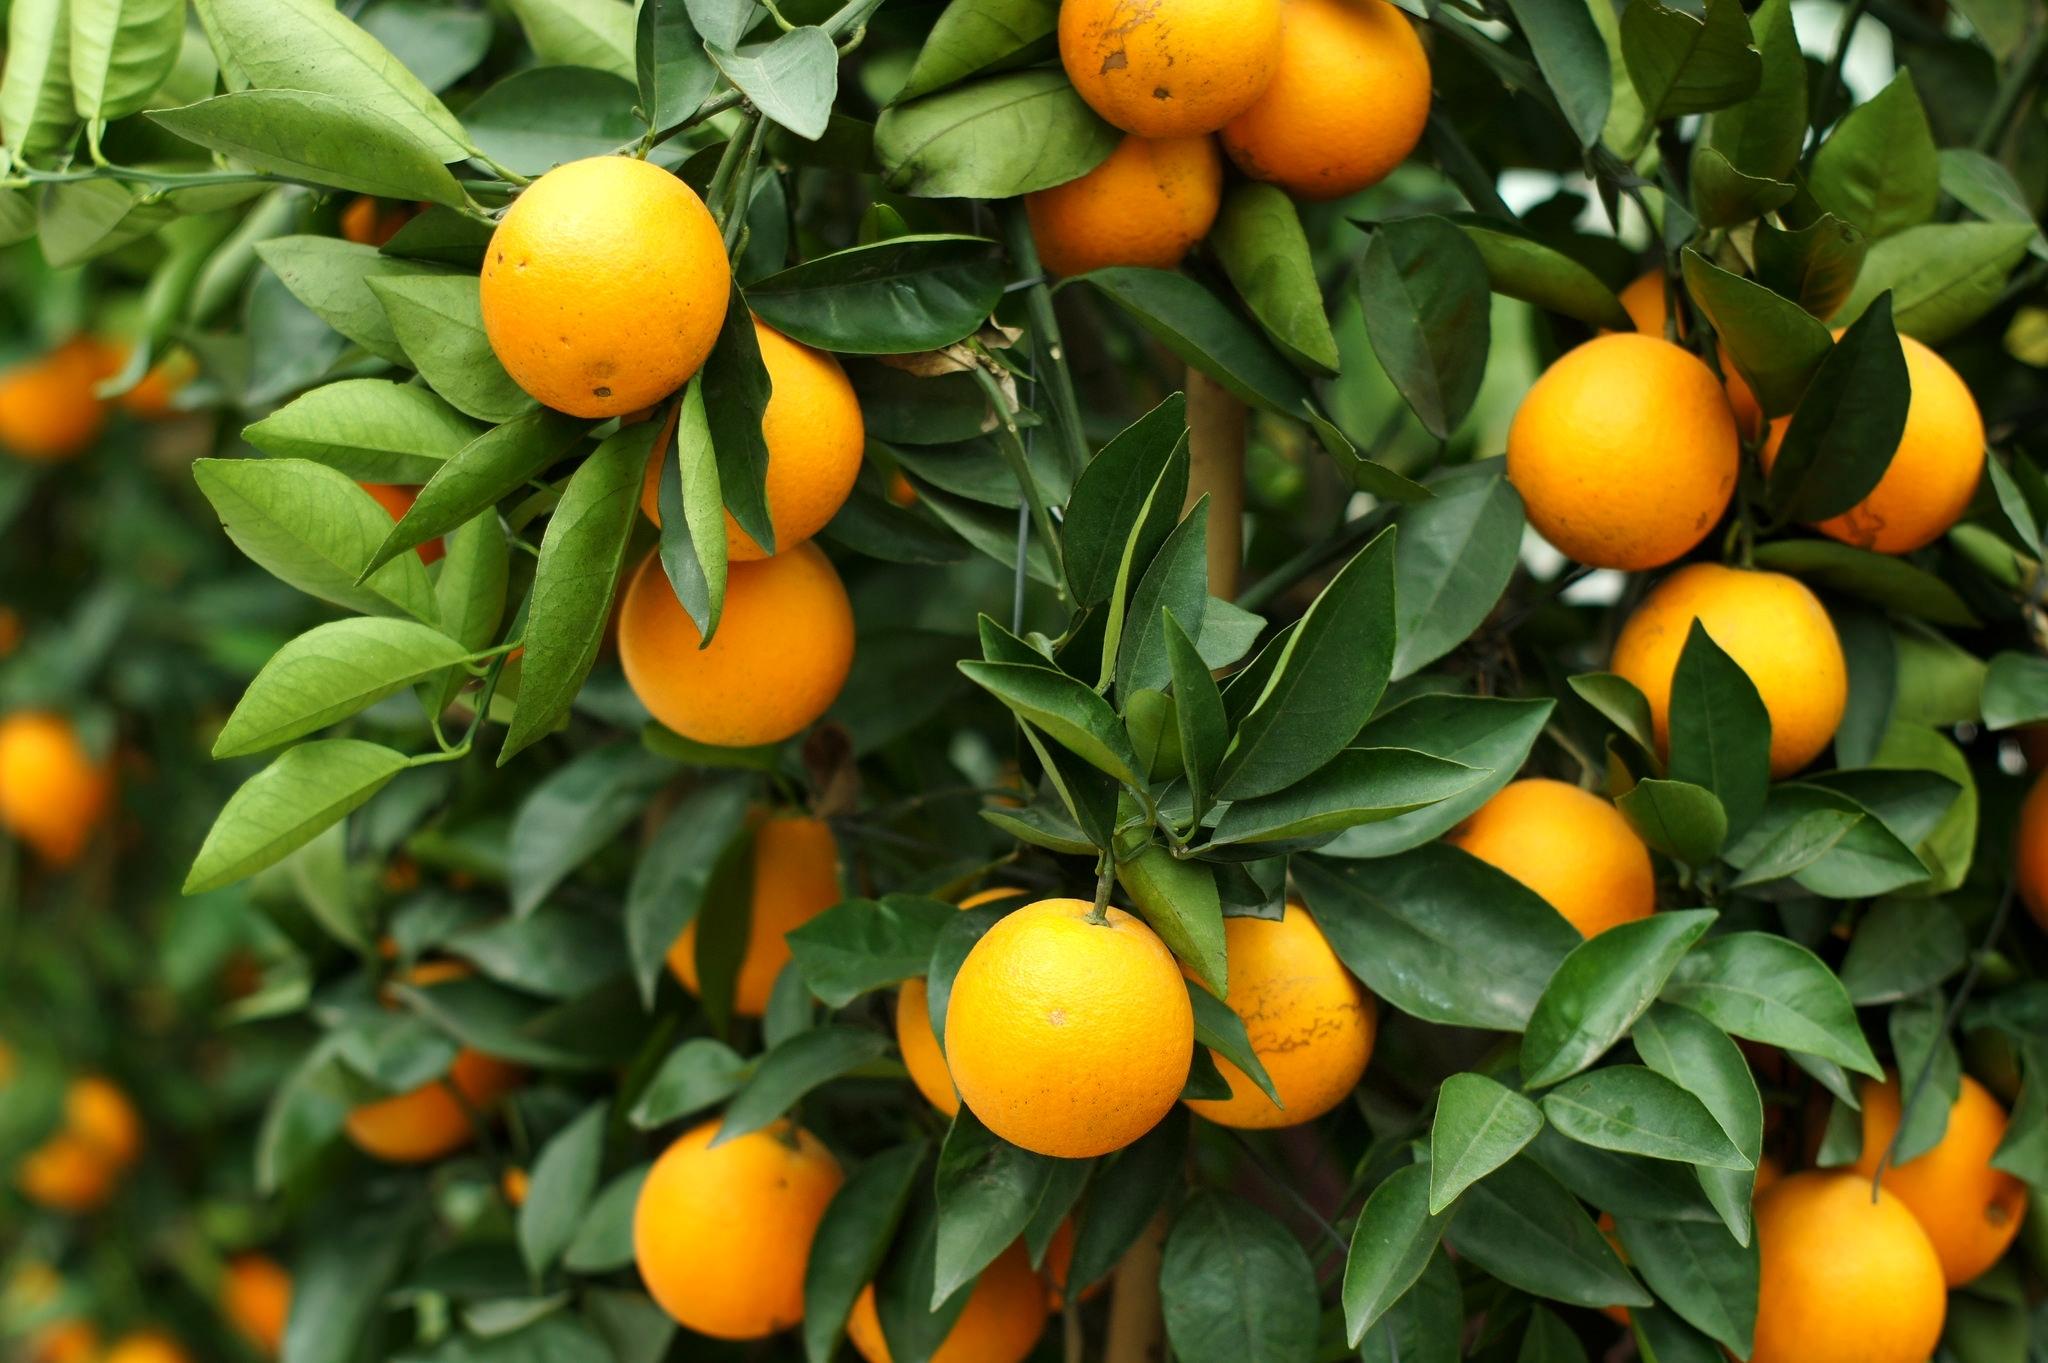 spelye-apelsiny-visyat-na-vetkax